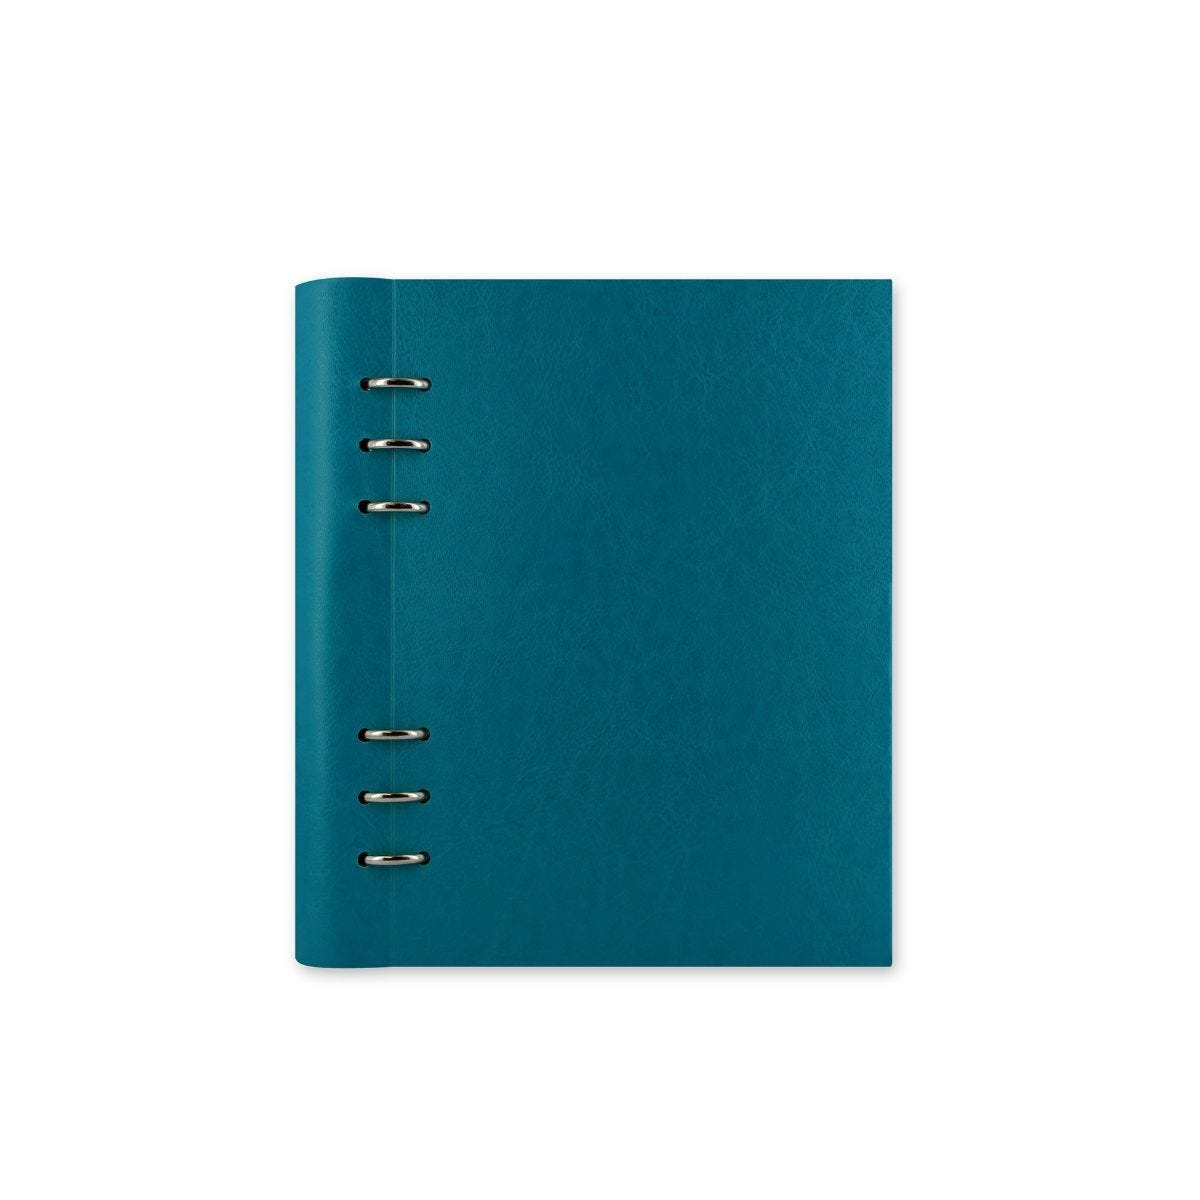 Filofax Refillable Clipbook Planner A5 Petrol Blue